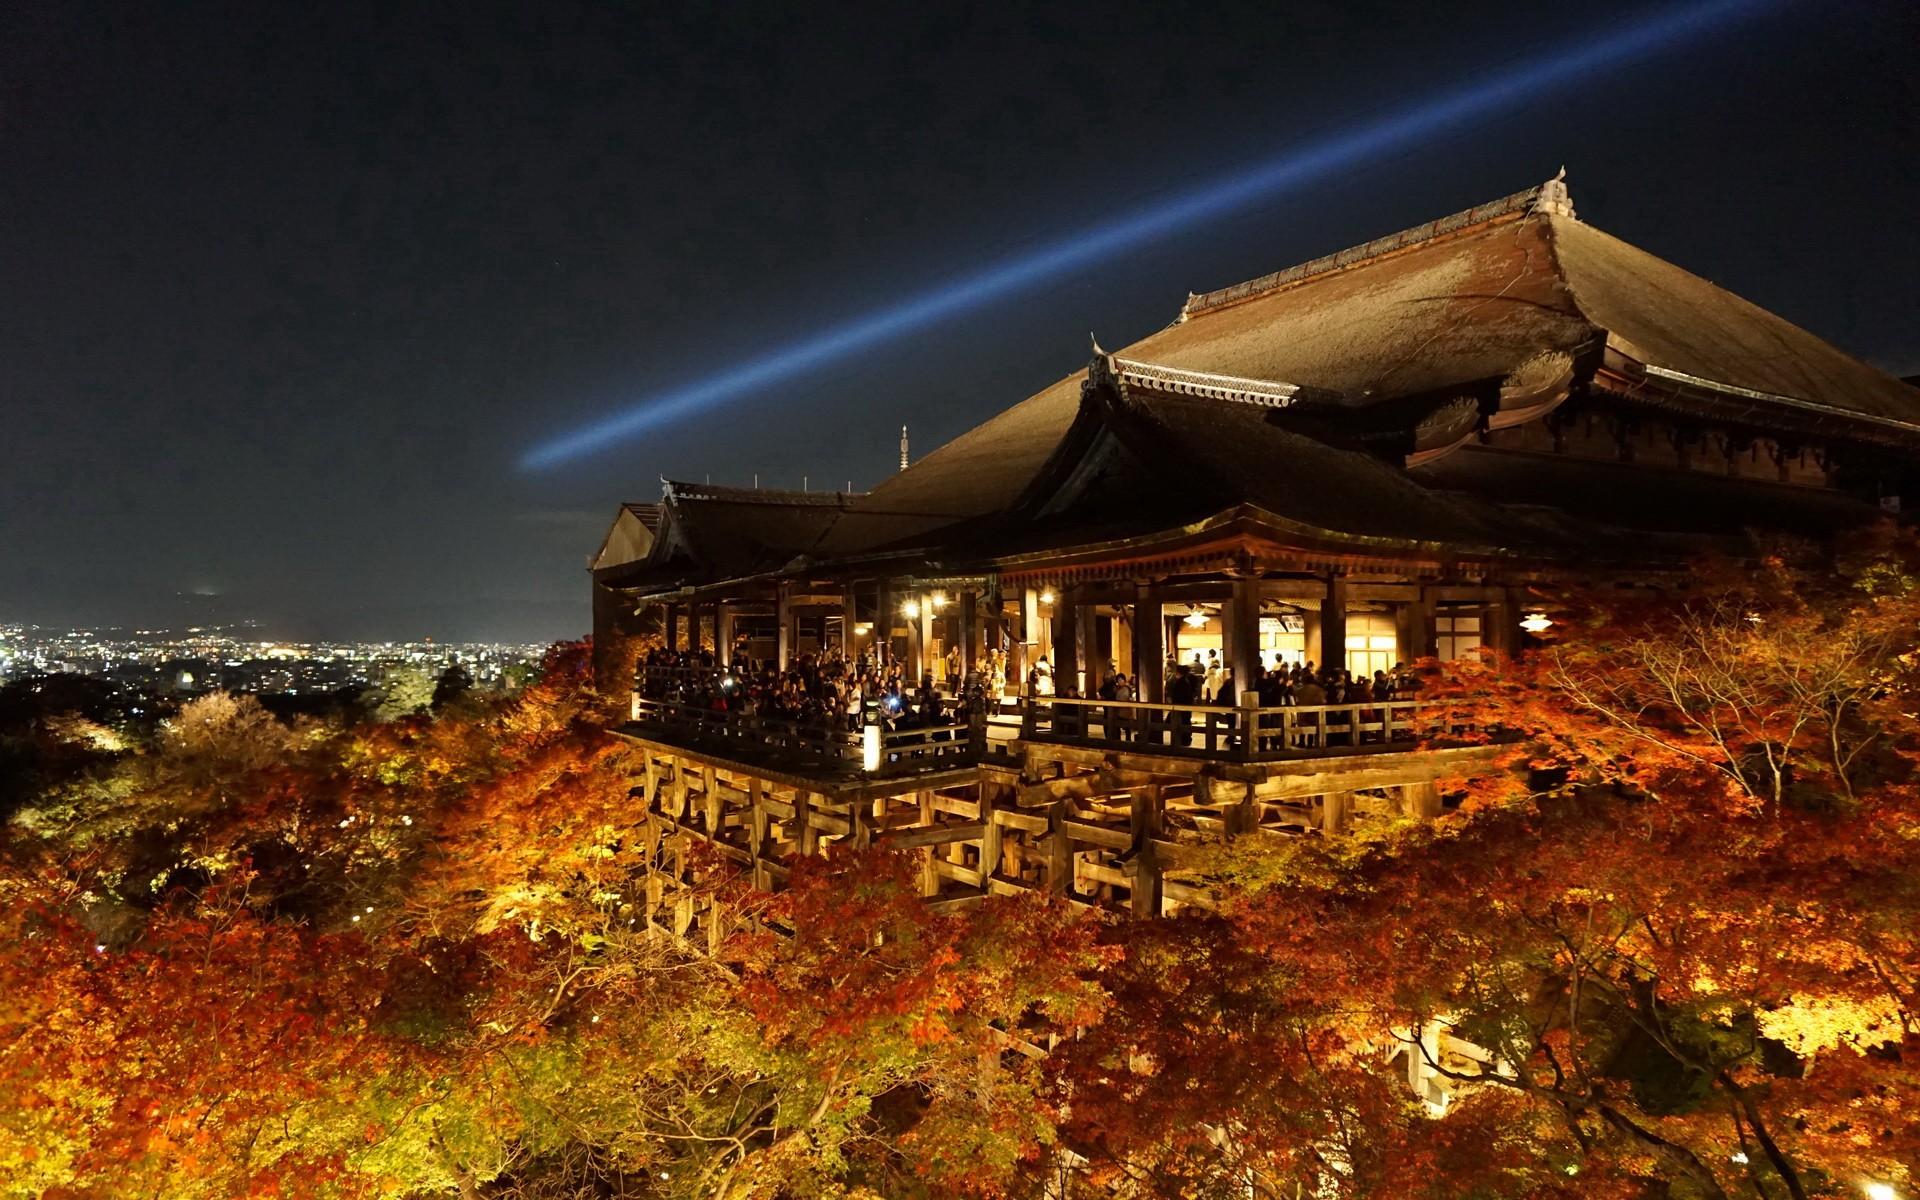 Most Inspiring Wallpaper Night Evening - temple-trees-night-evening-castle-kiyomizu-dera-Kyoto-autumn-landmark-computer-wallpaper-58368  Photograph-526048.jpg